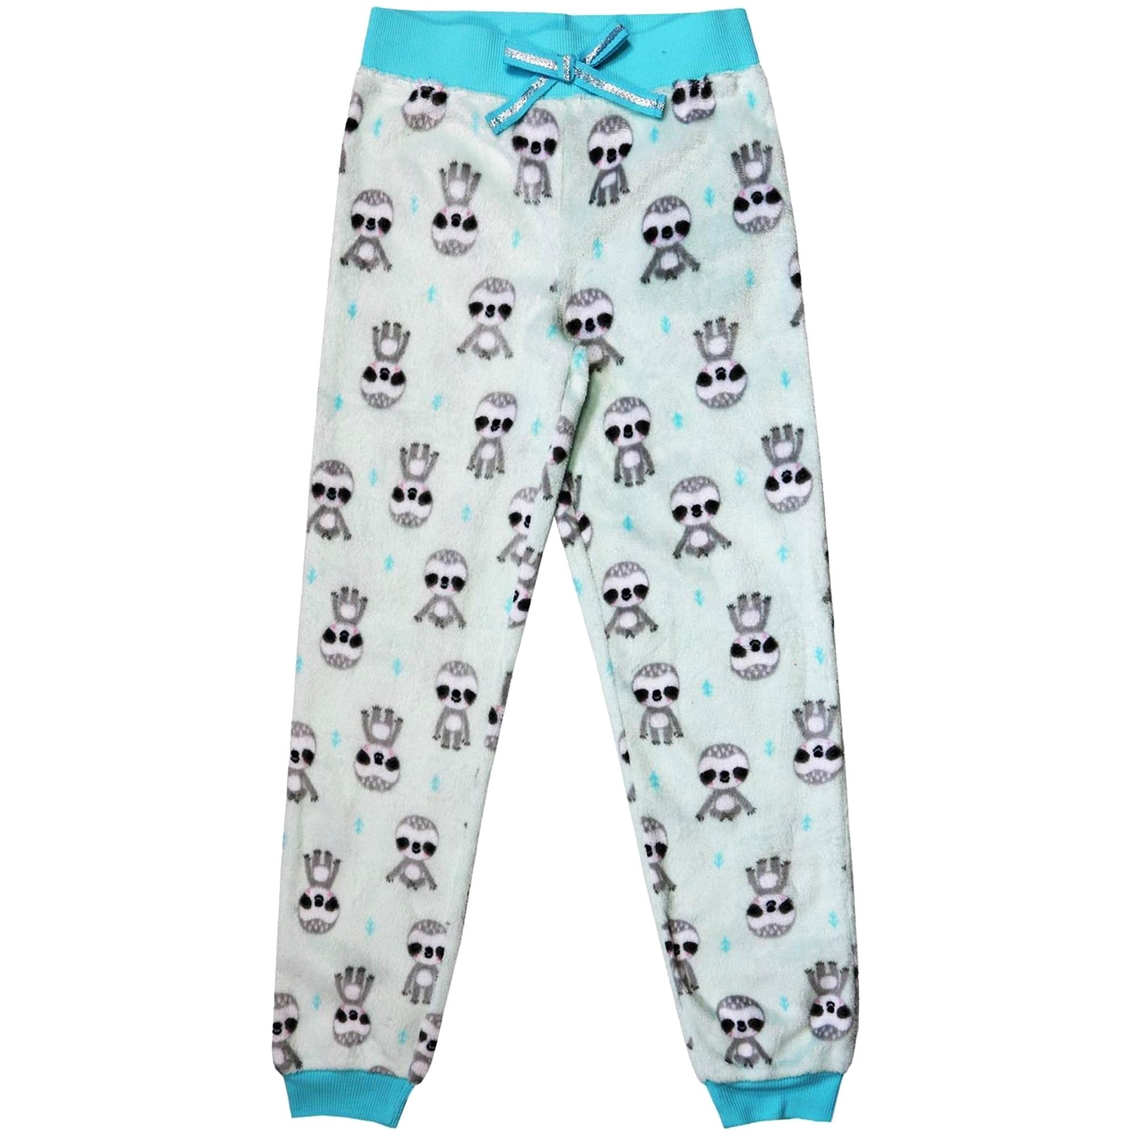 42e3c2d4f8c872 Jelli Fish Kids Girls Sloth Sleep Pants | Girls 7-16 | Apparel ...